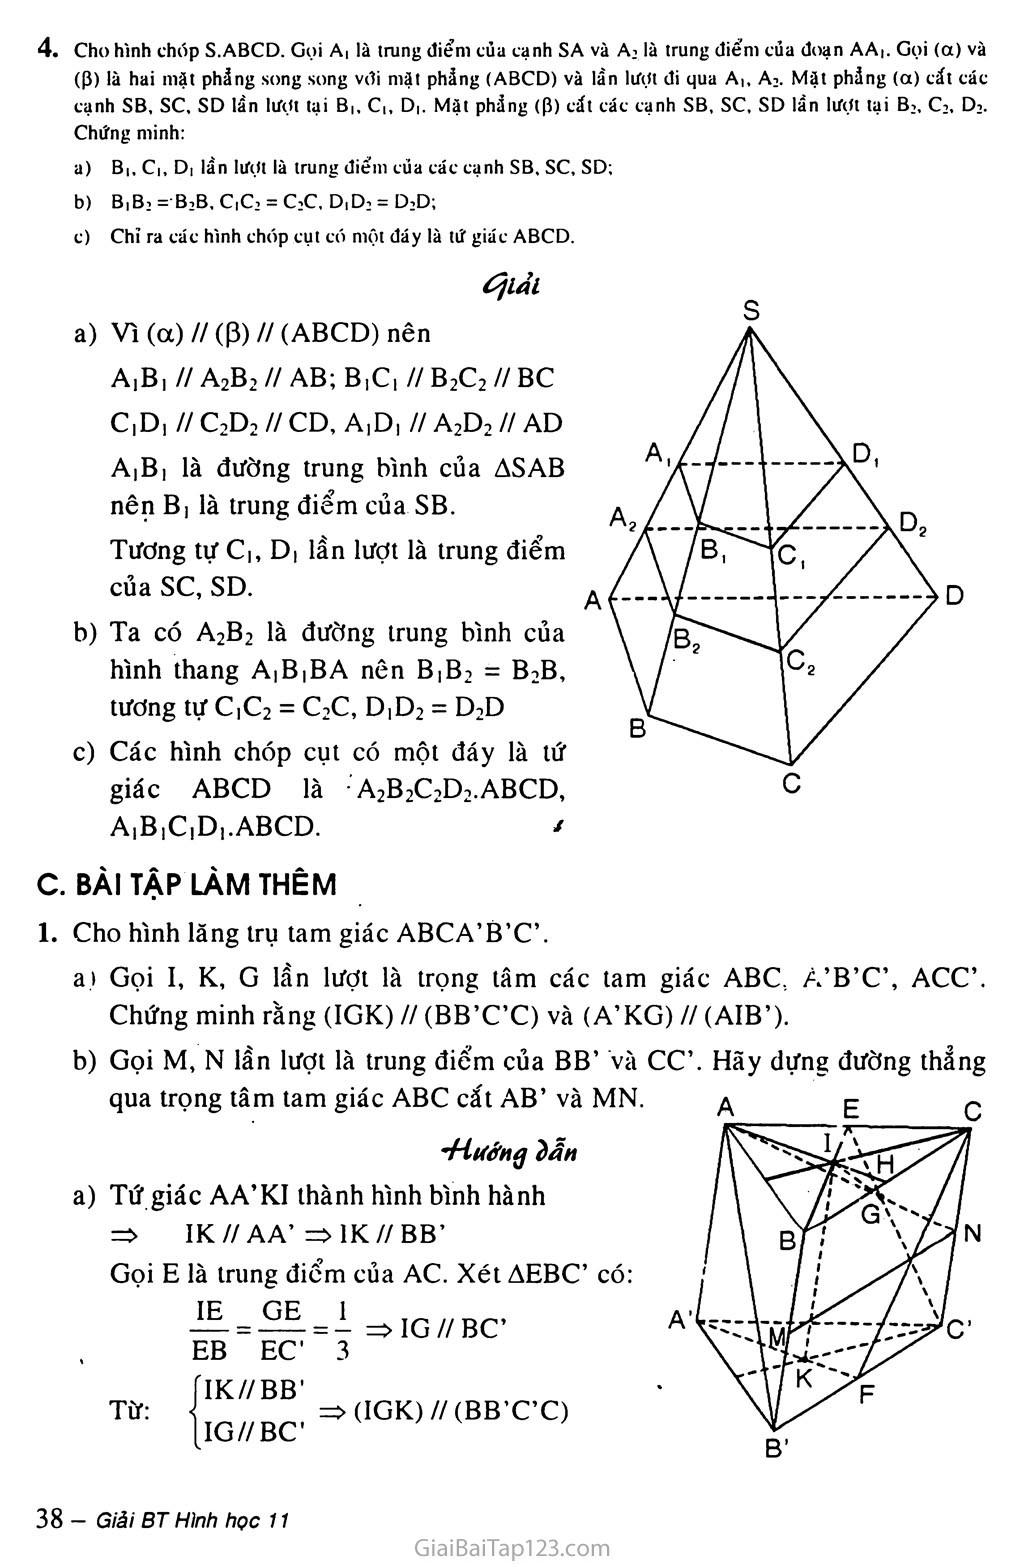 Bài 4. Hai mặt phẳng song song trang 5